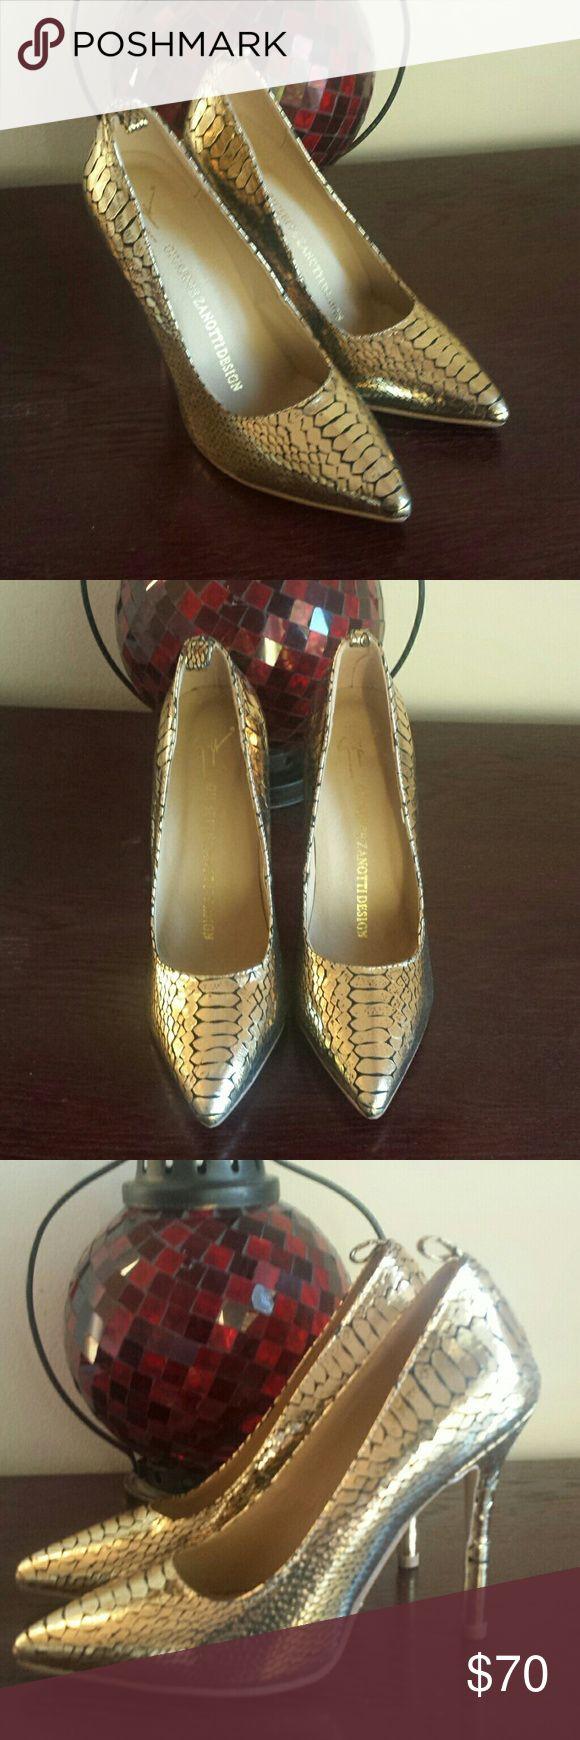 GIUSEPPE ZANOTTI DESIGN GOLD HEELS SHOE 7.5 Worn twice. Amazing heels. Giuseppe Zanotti Shoes Heels